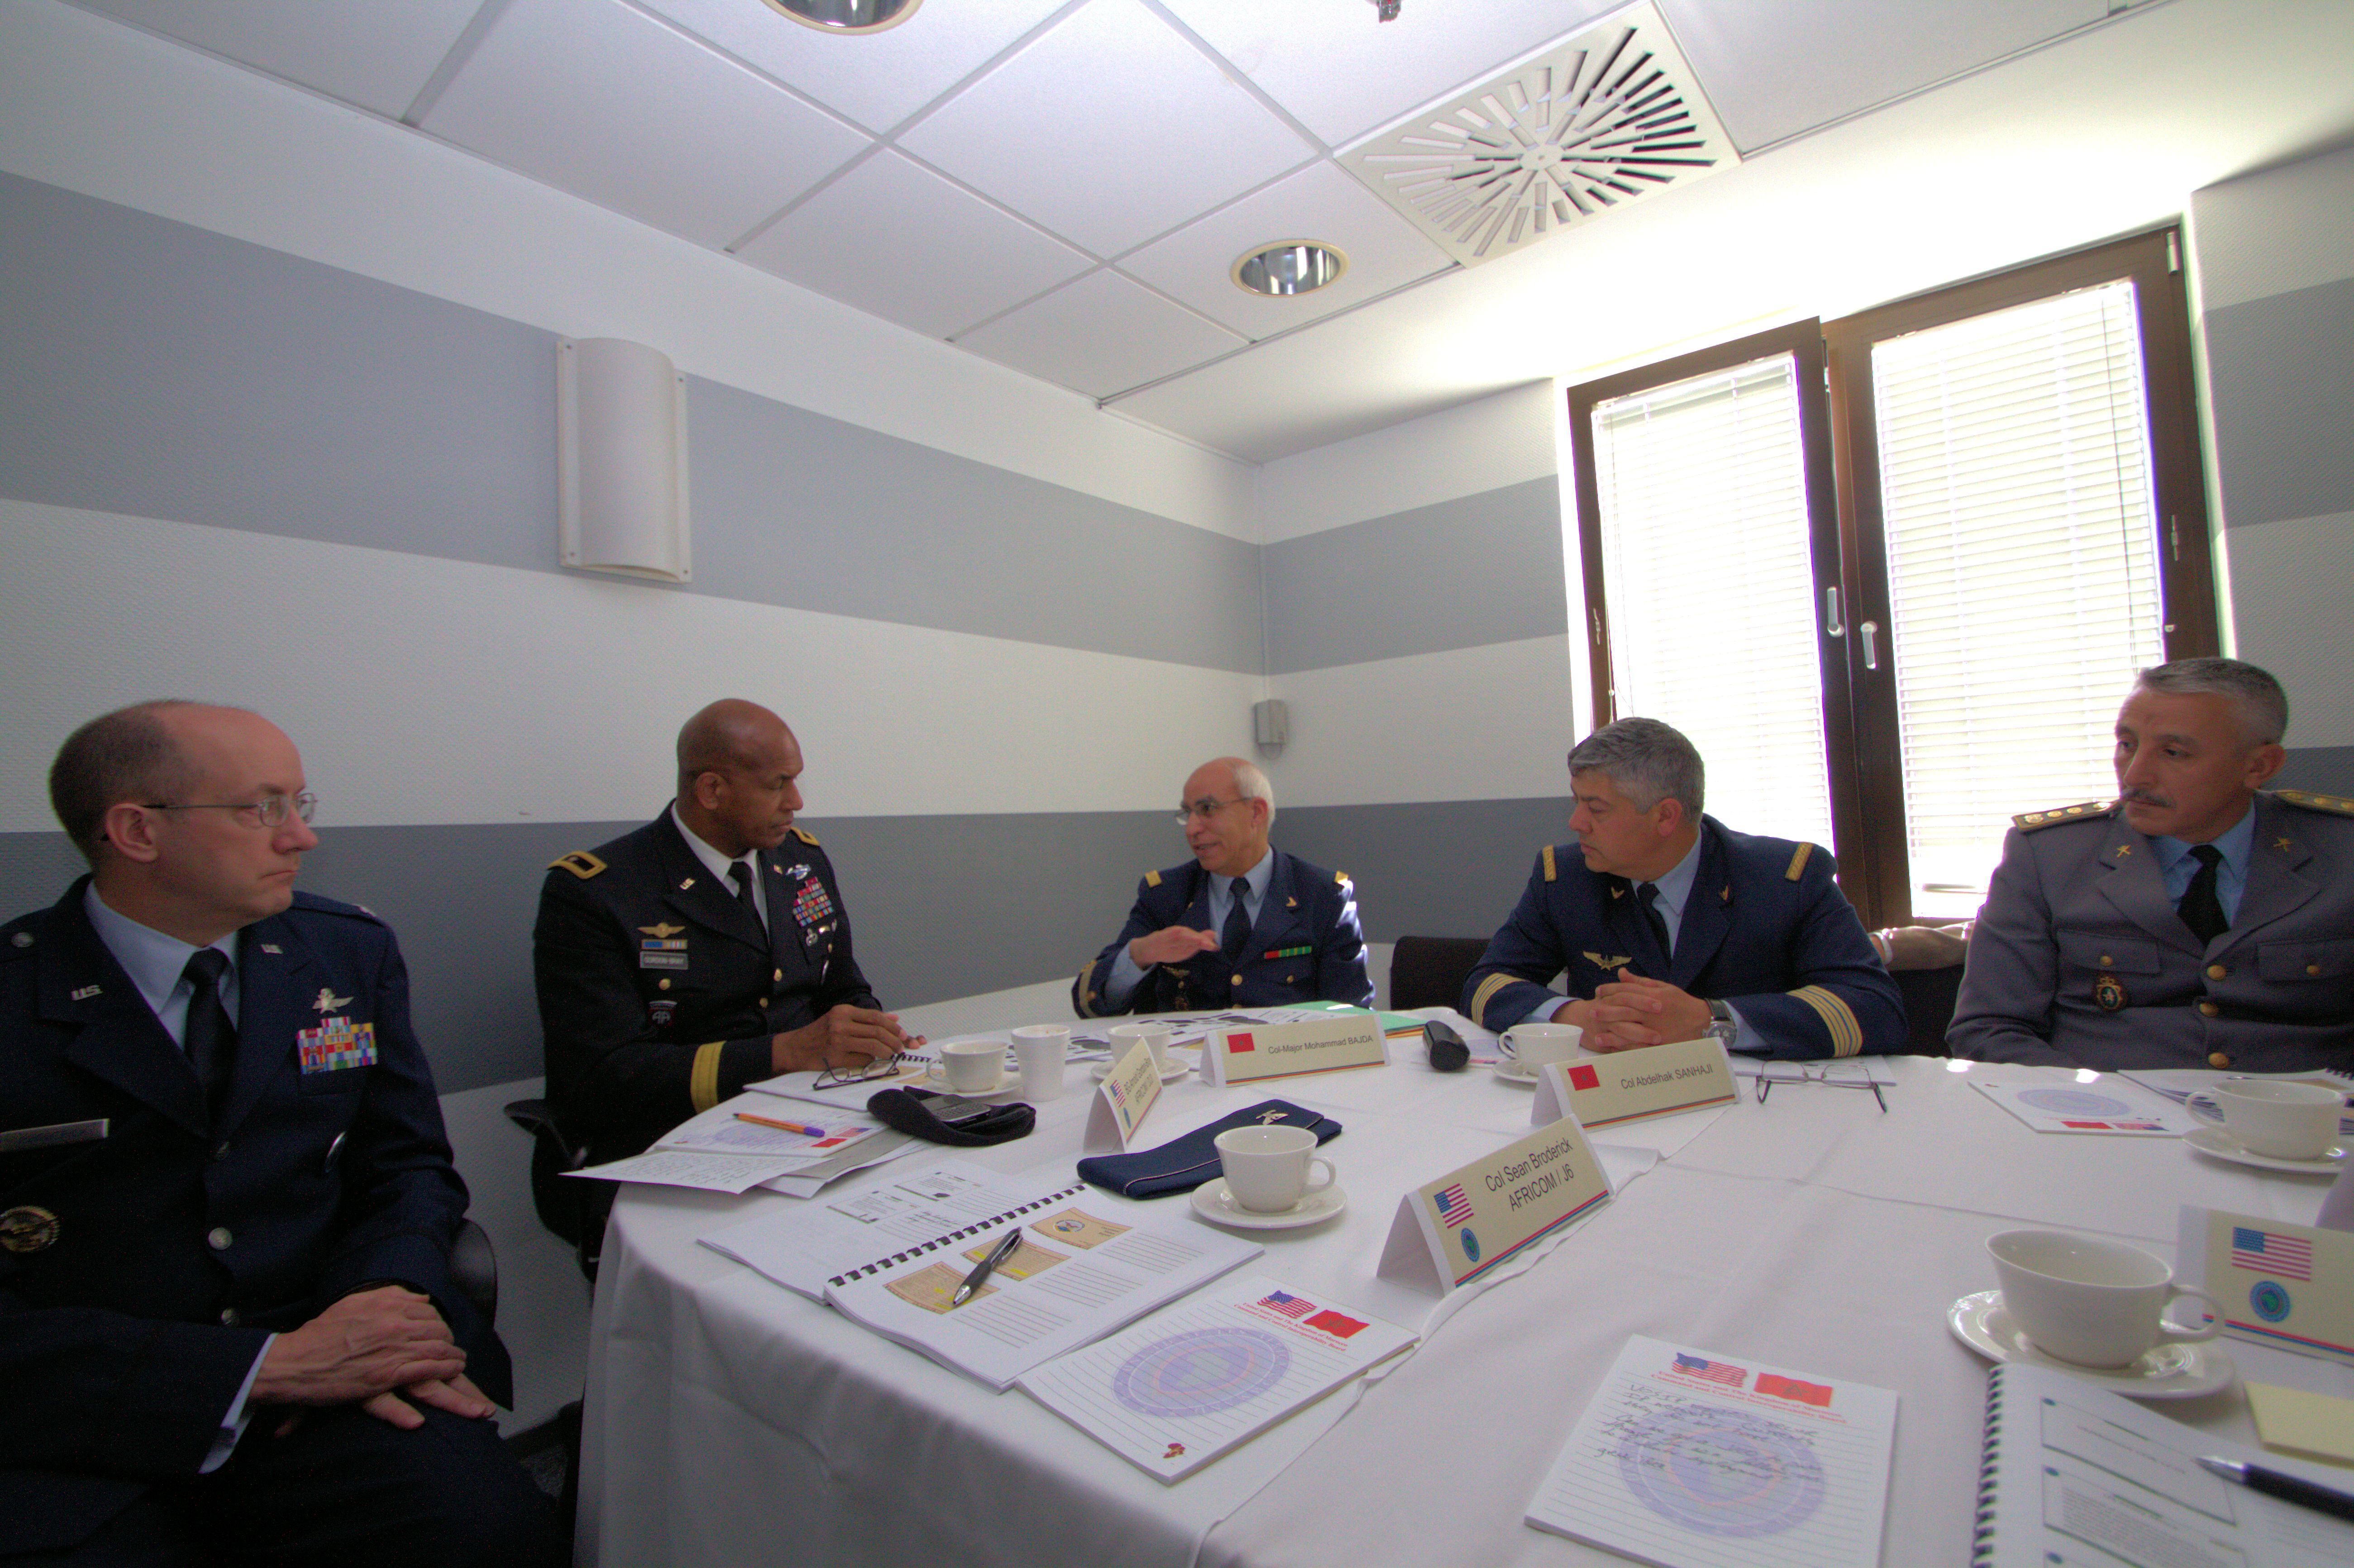 Cooperation militaire avec les USA - Page 2 7175115492_3b1eb5c125_o